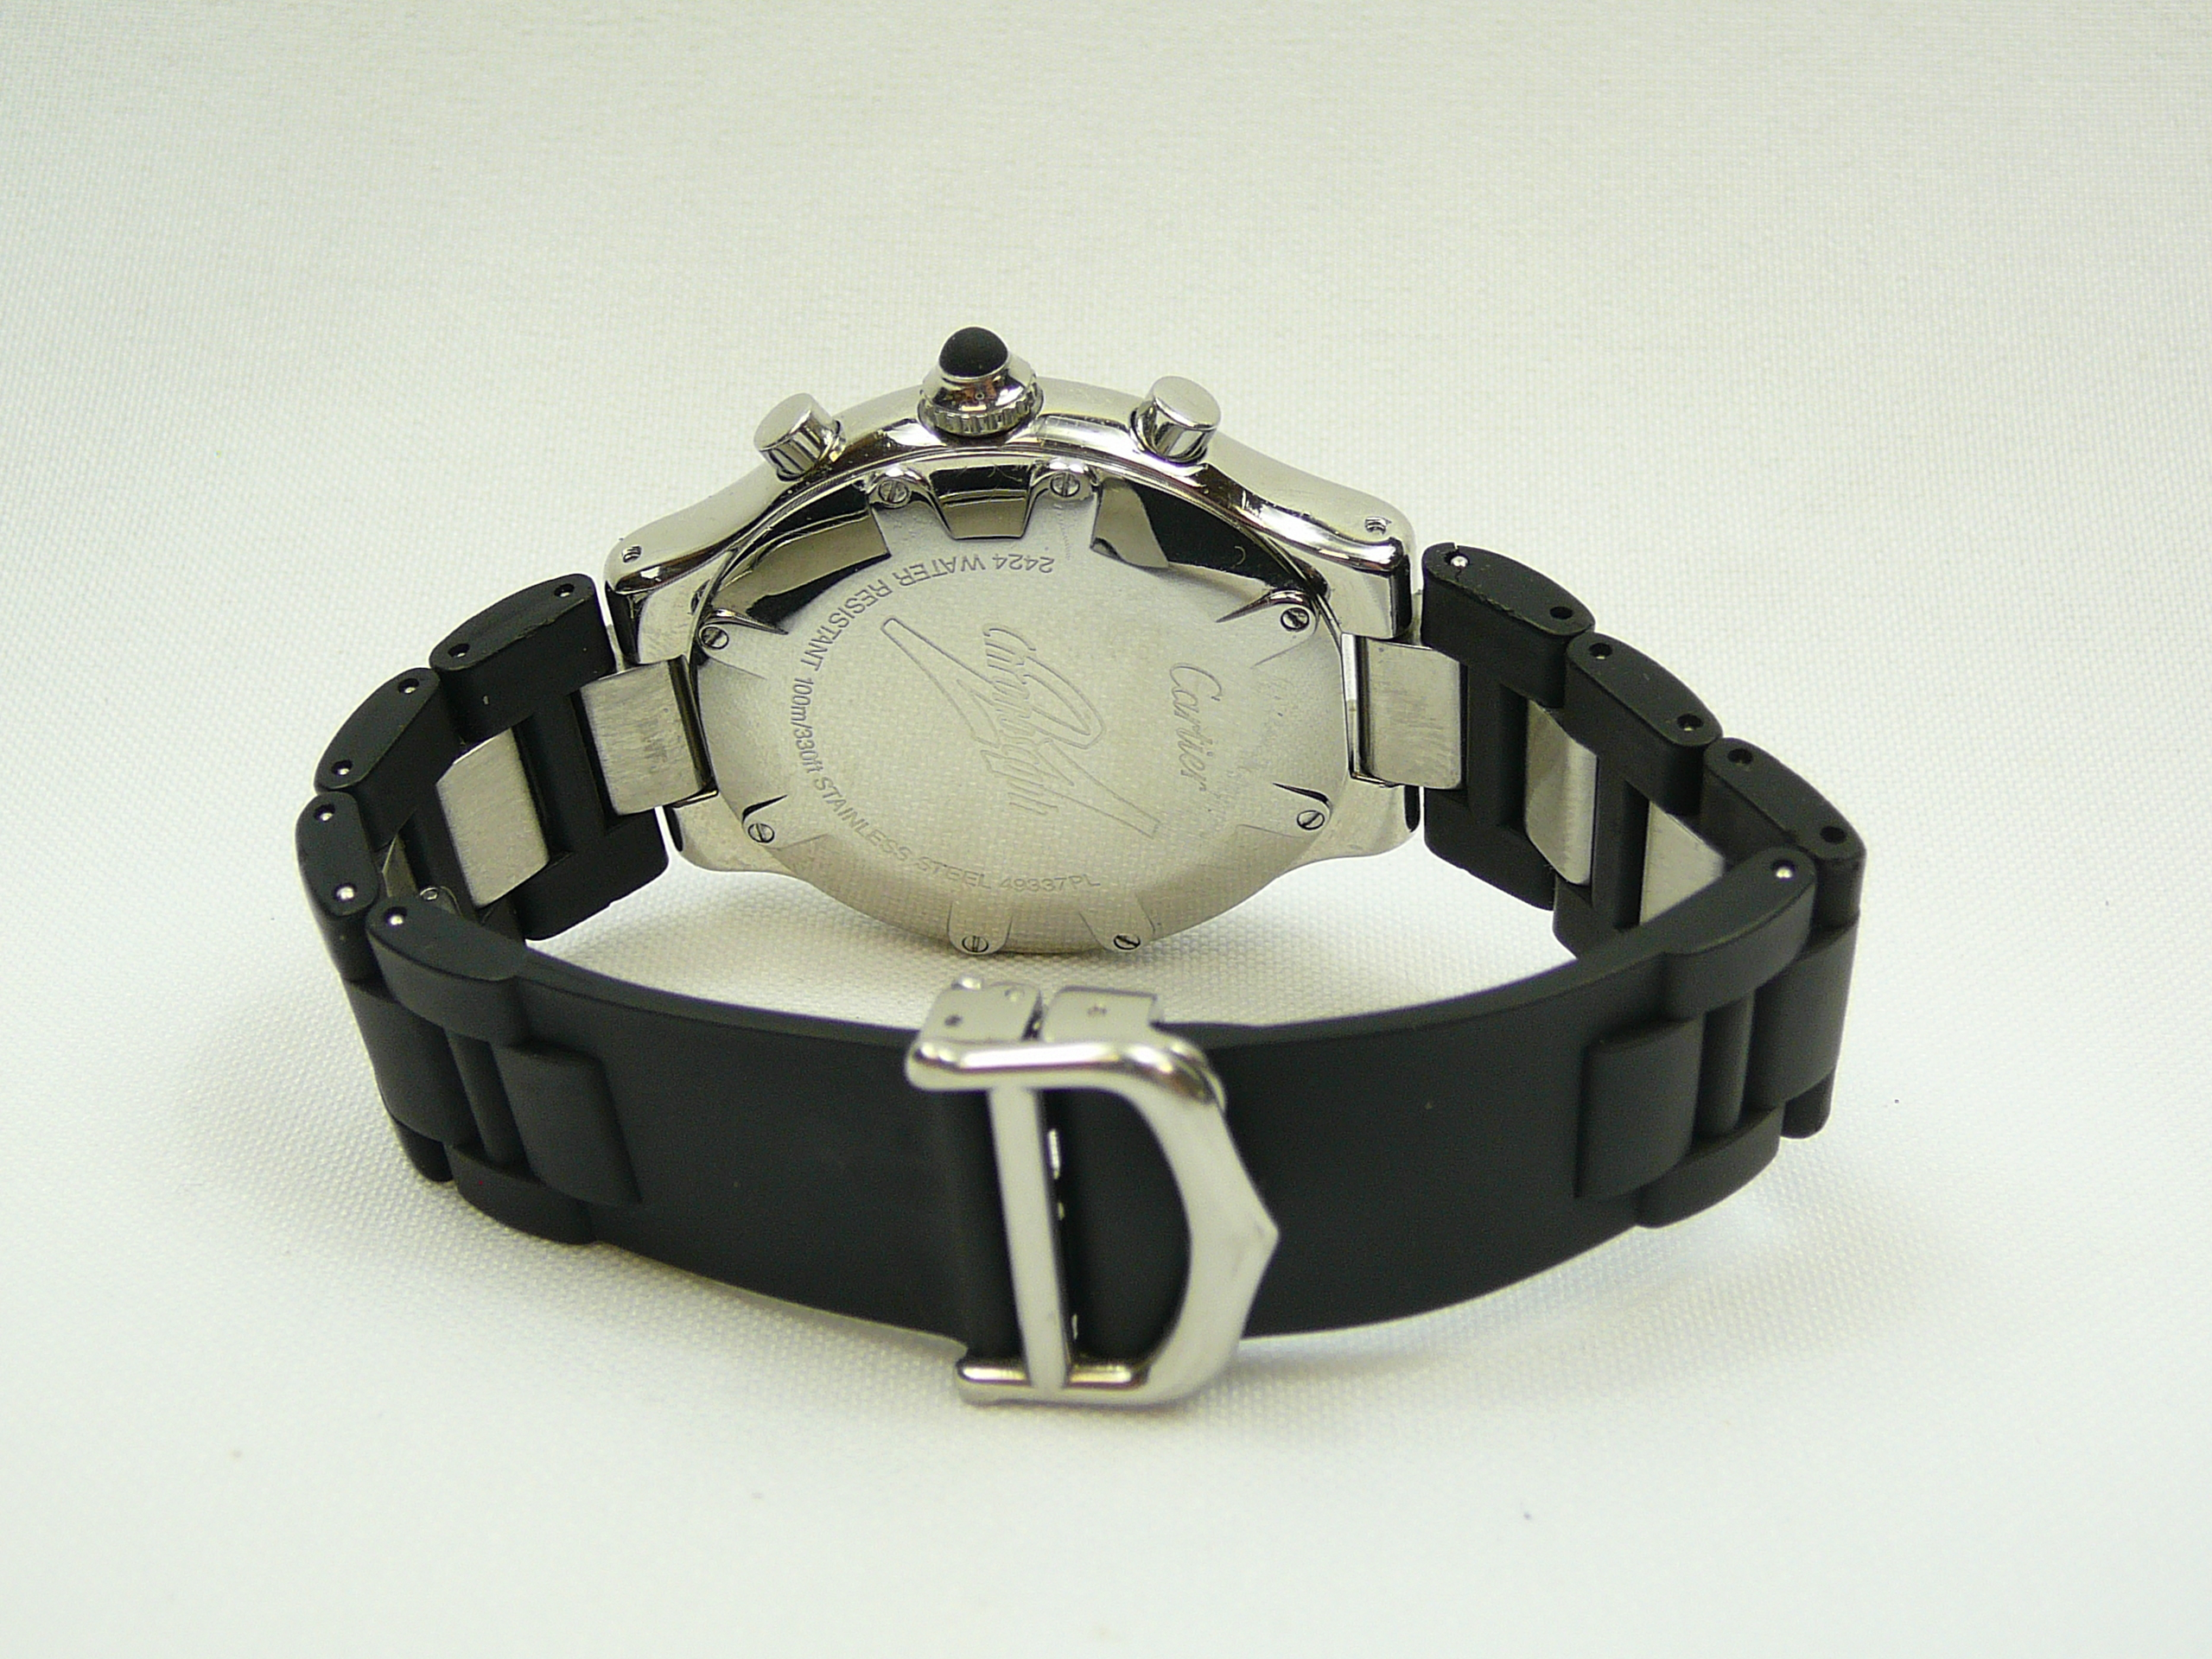 Gents Cartier Wrist Watch - Image 3 of 3